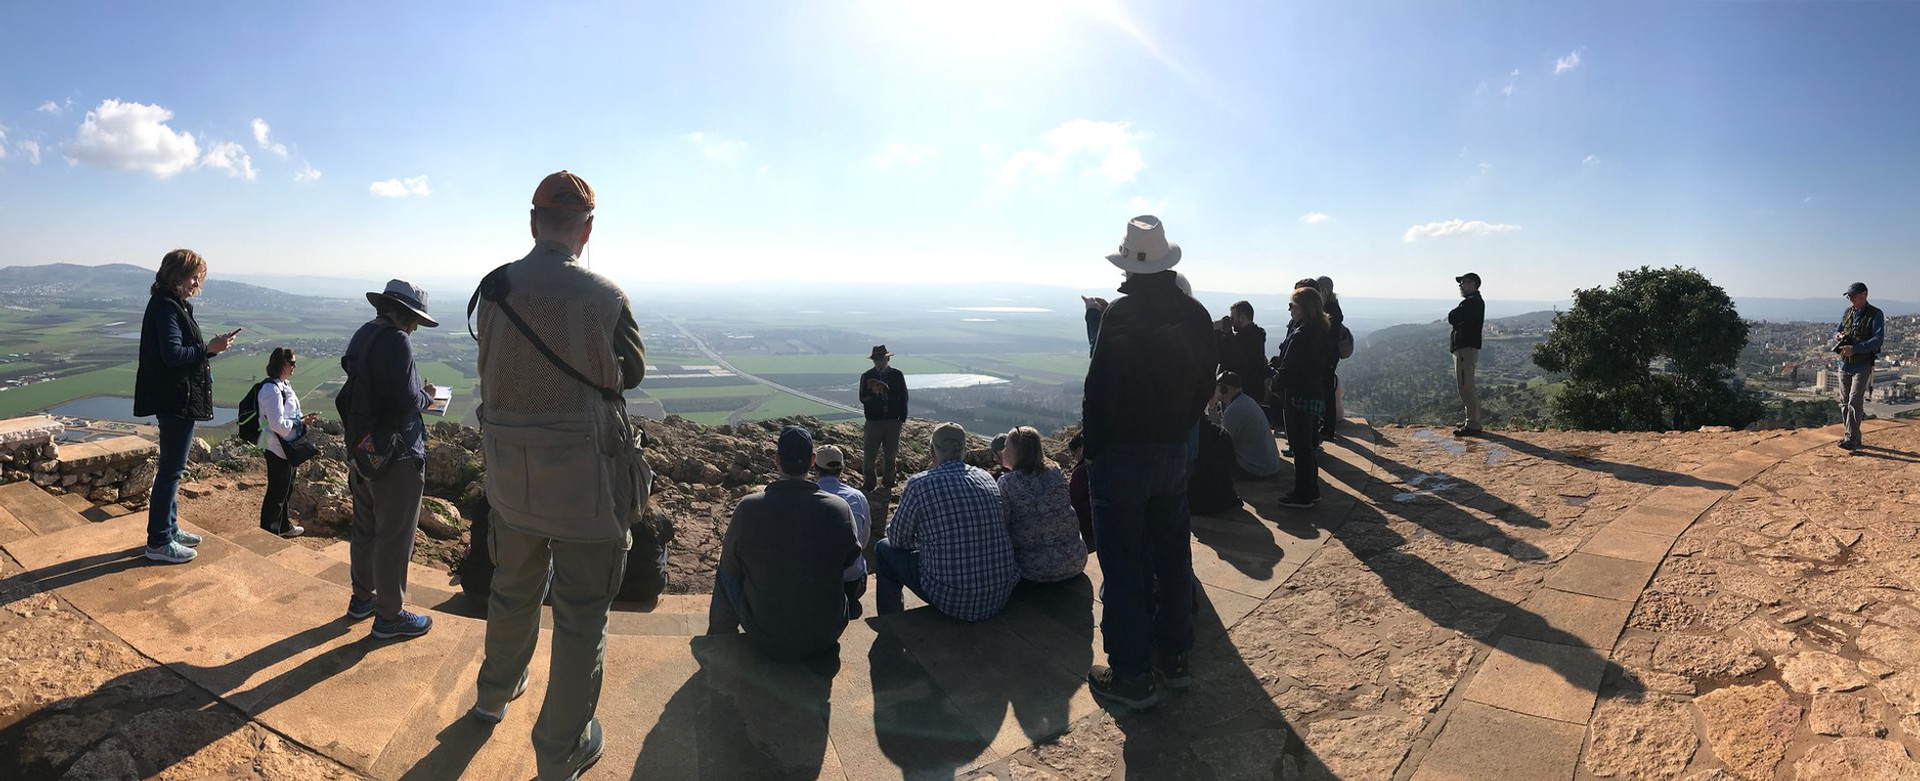 Overlook above Nazareth